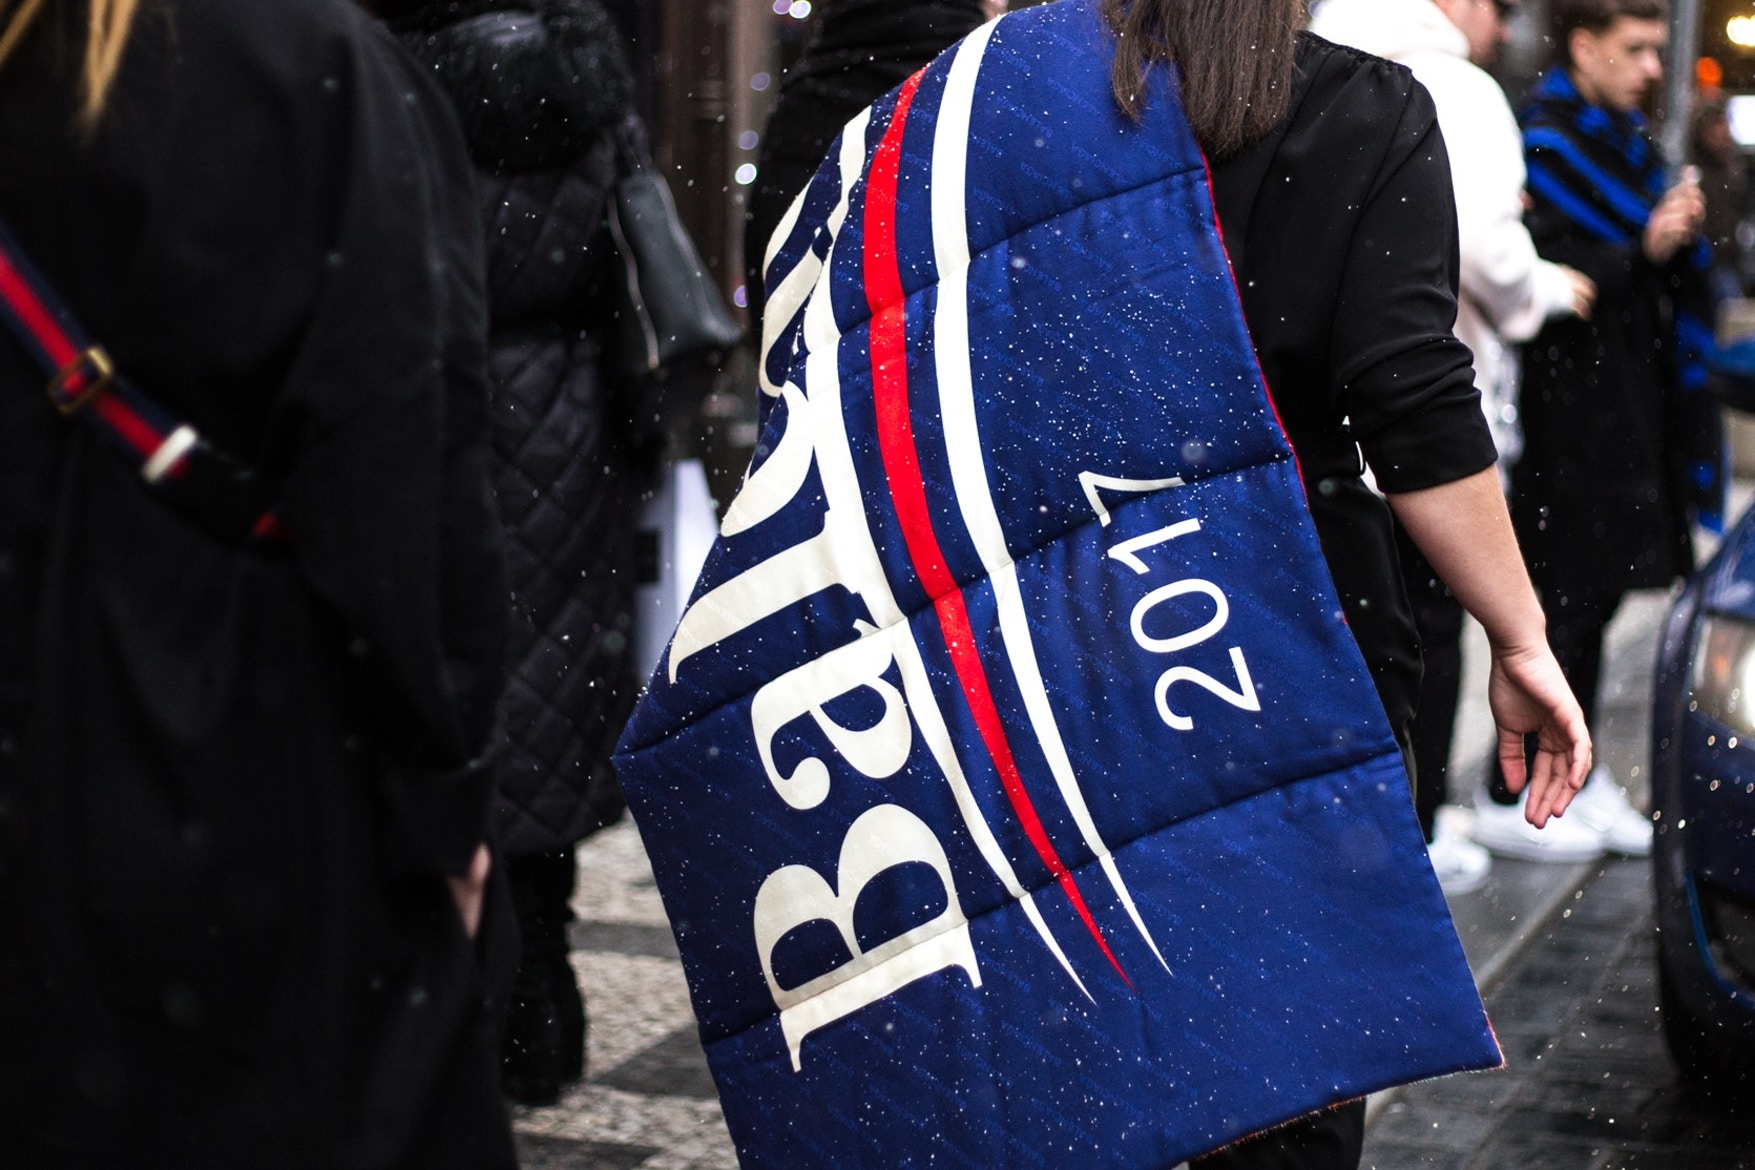 Balenciaga: The World's Hottest Brand for the Third Consecutive Quarter